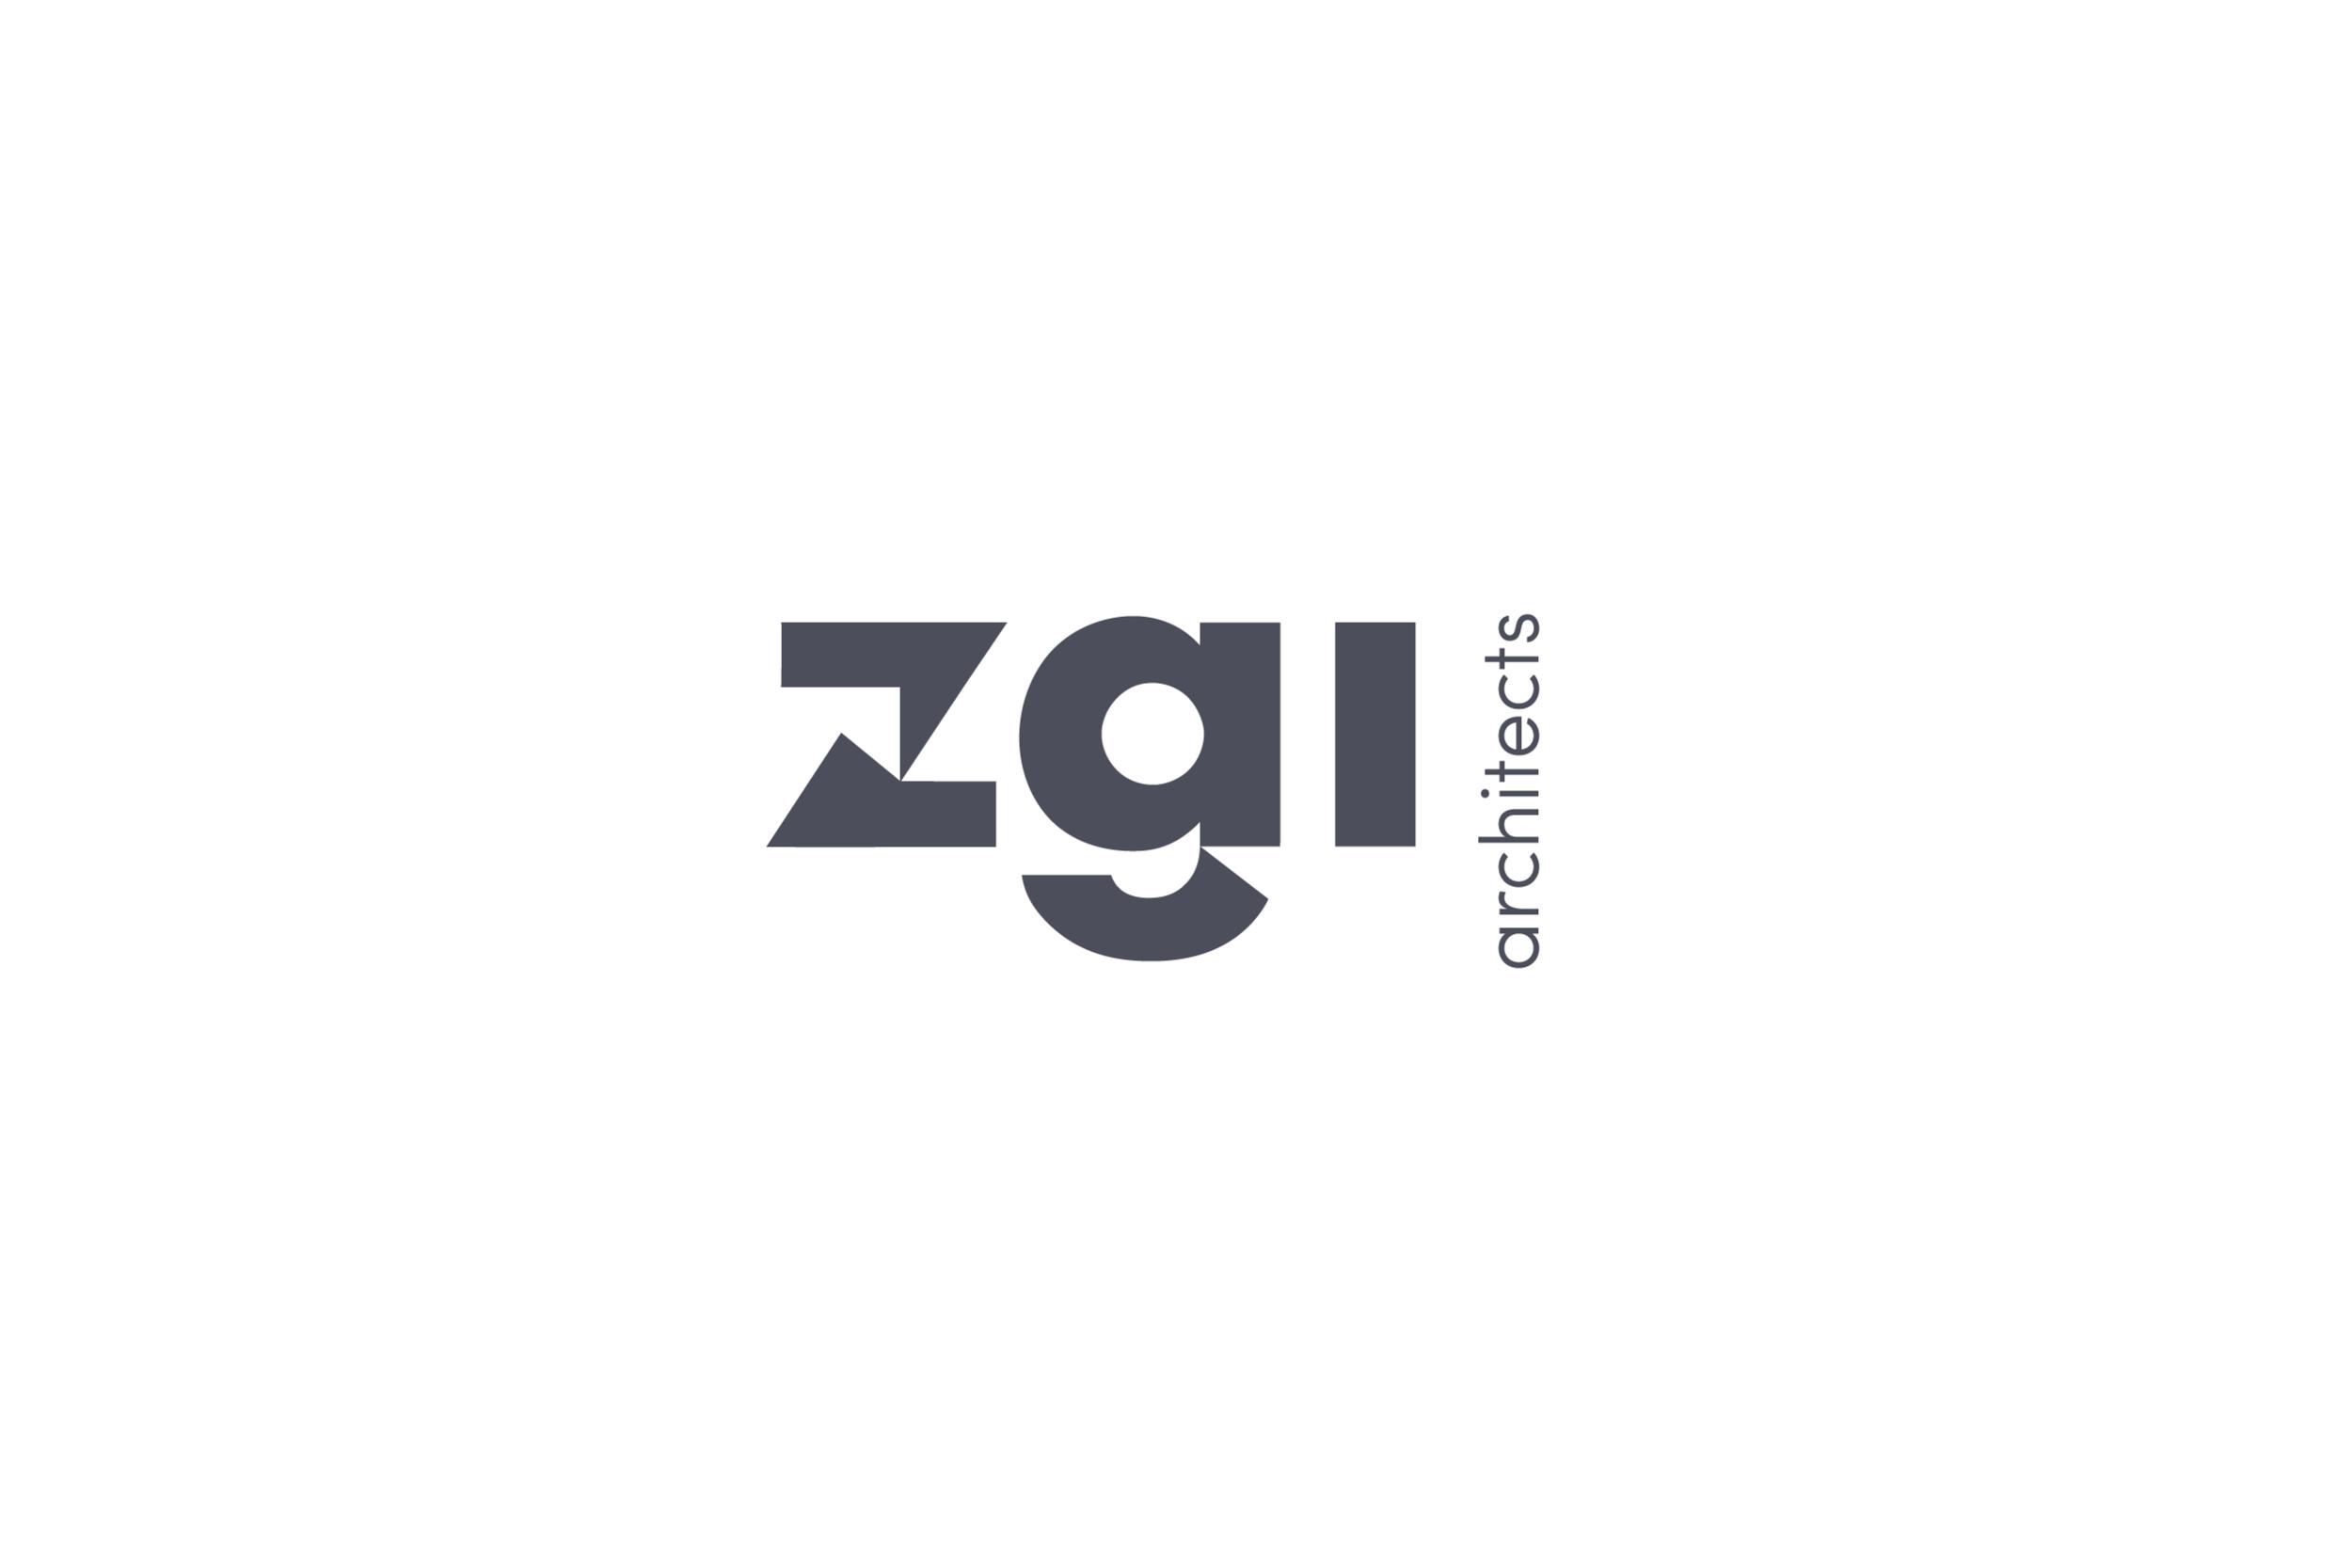 zgi-logo-lockup.png